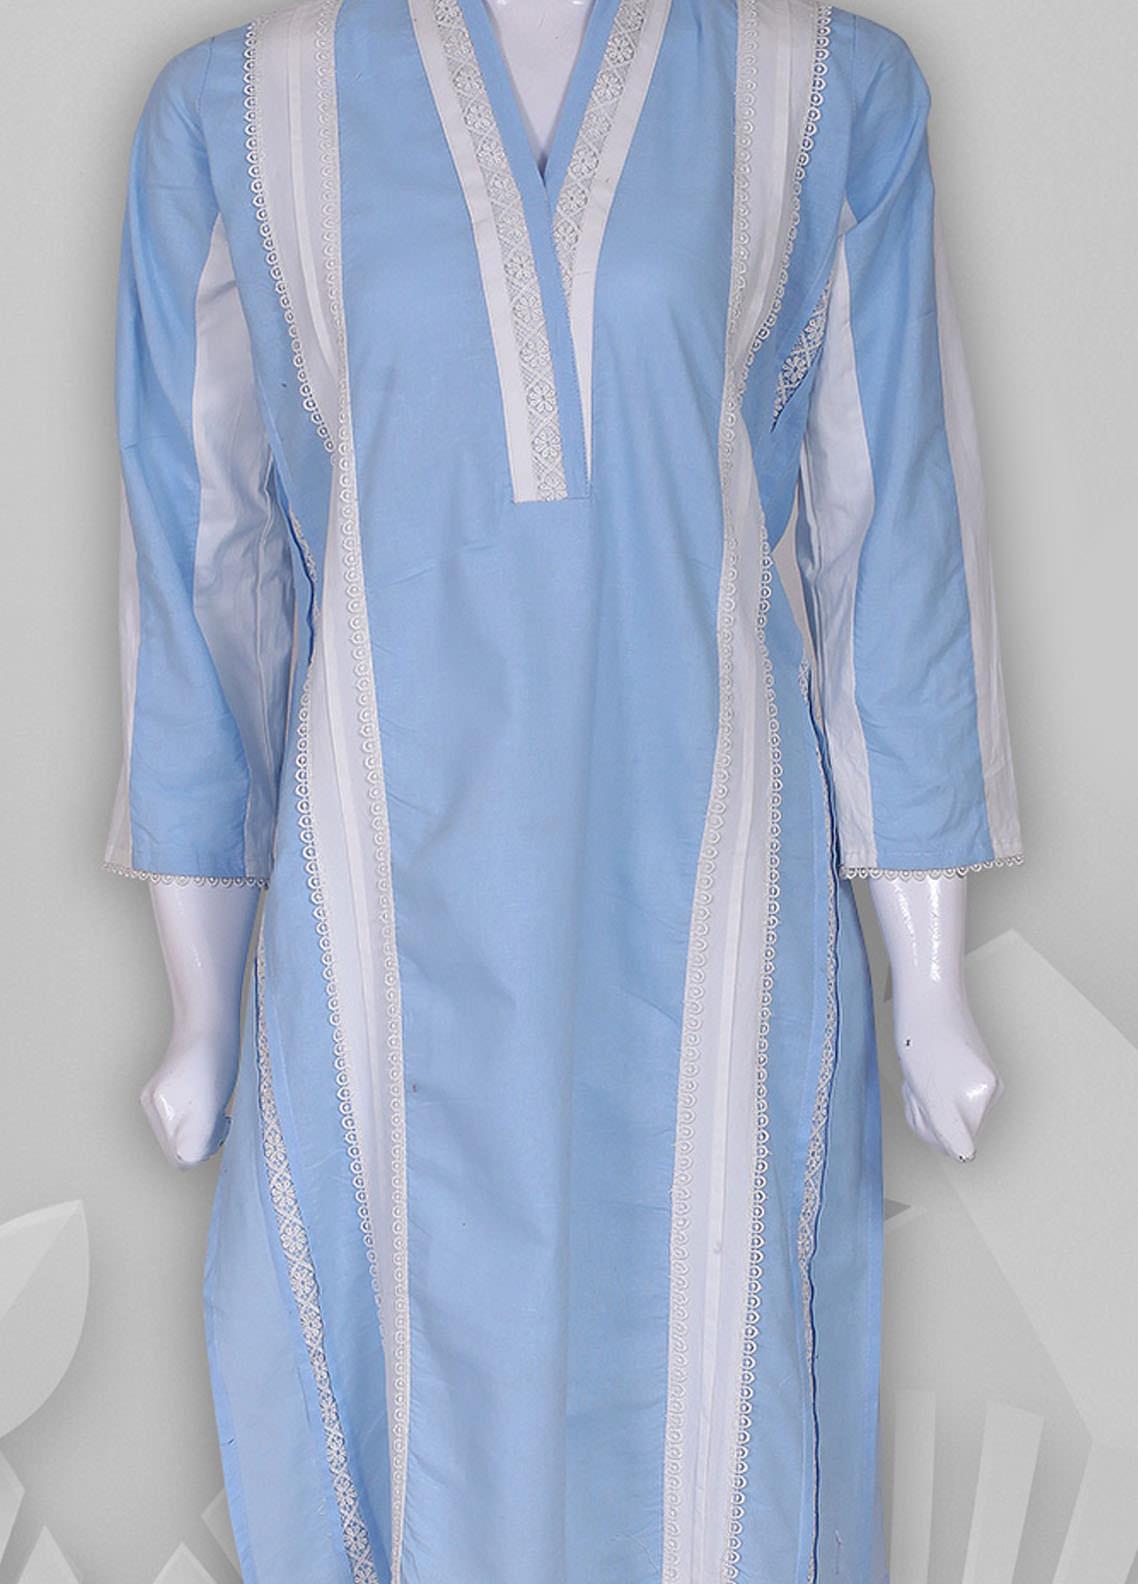 Sheep Casual Cotton Stitched Kurti SC200542 BLUE